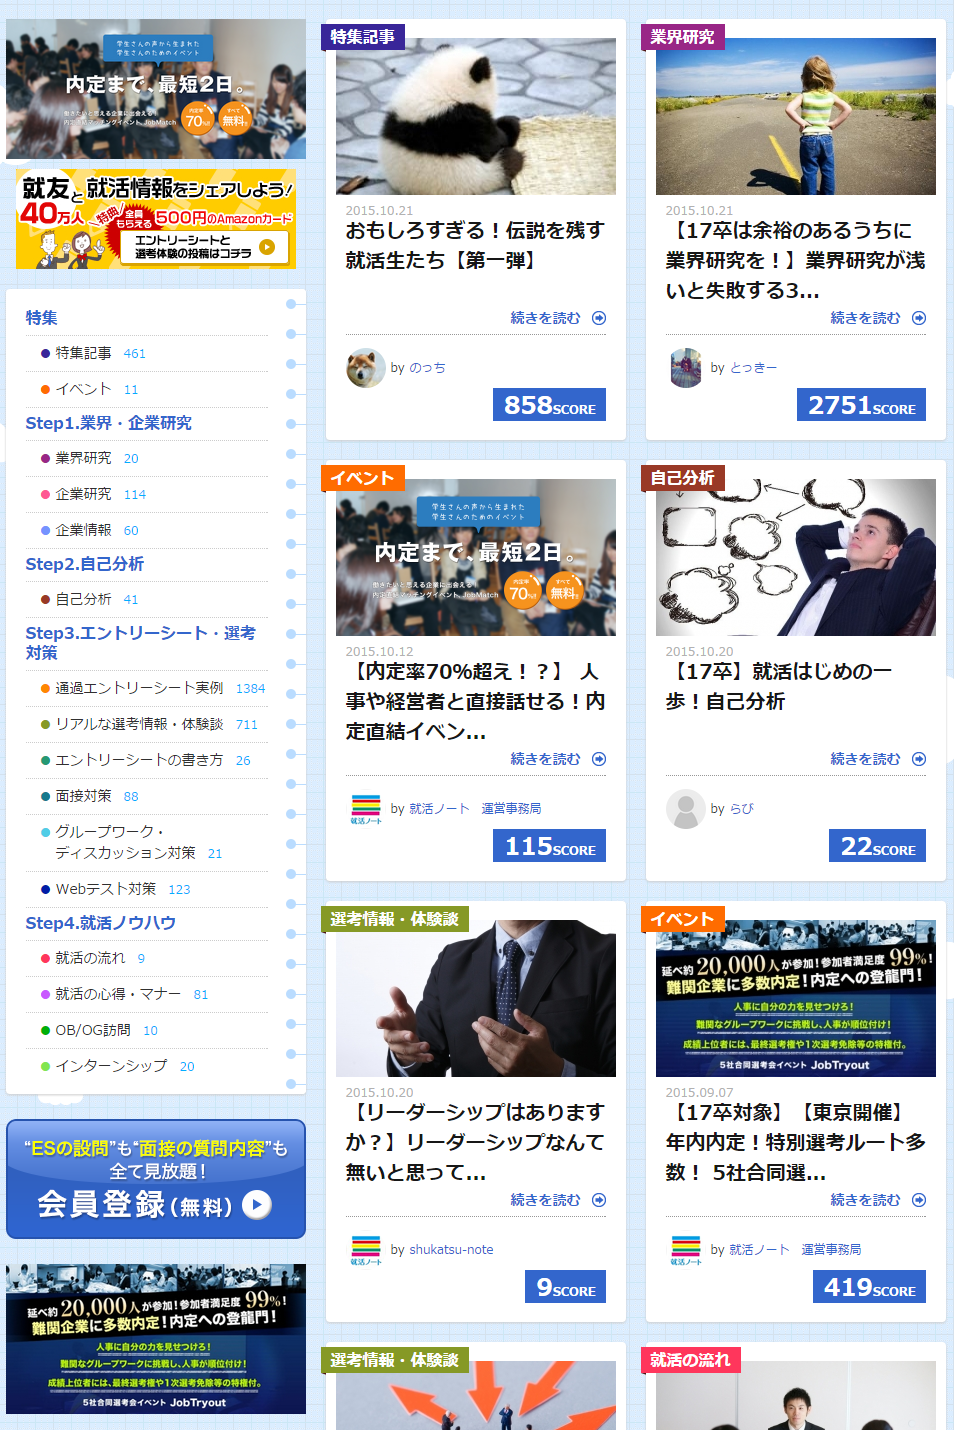 FireShot Capture 186 - 就活ノート|就活生がつくるリアルな就活情報・選考レポート - http___www.shukatsu-note.com_